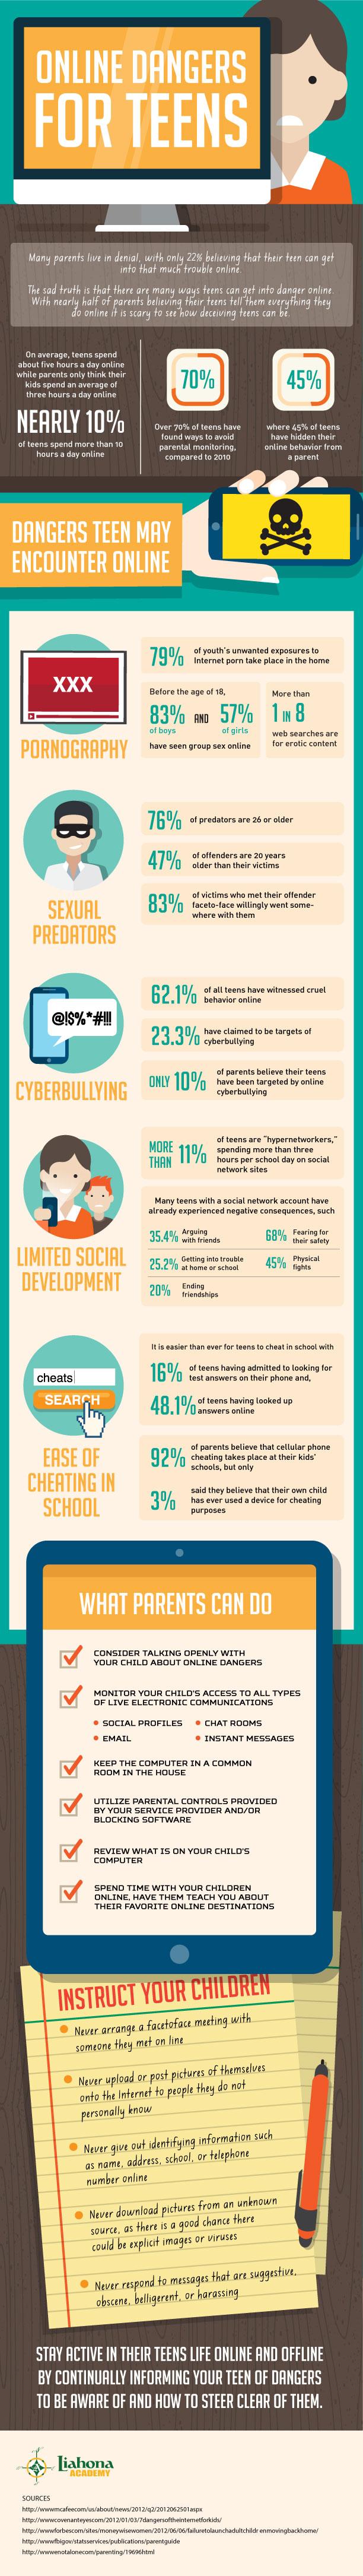 Online-Dangers-For-Teens-Infographic-plaza